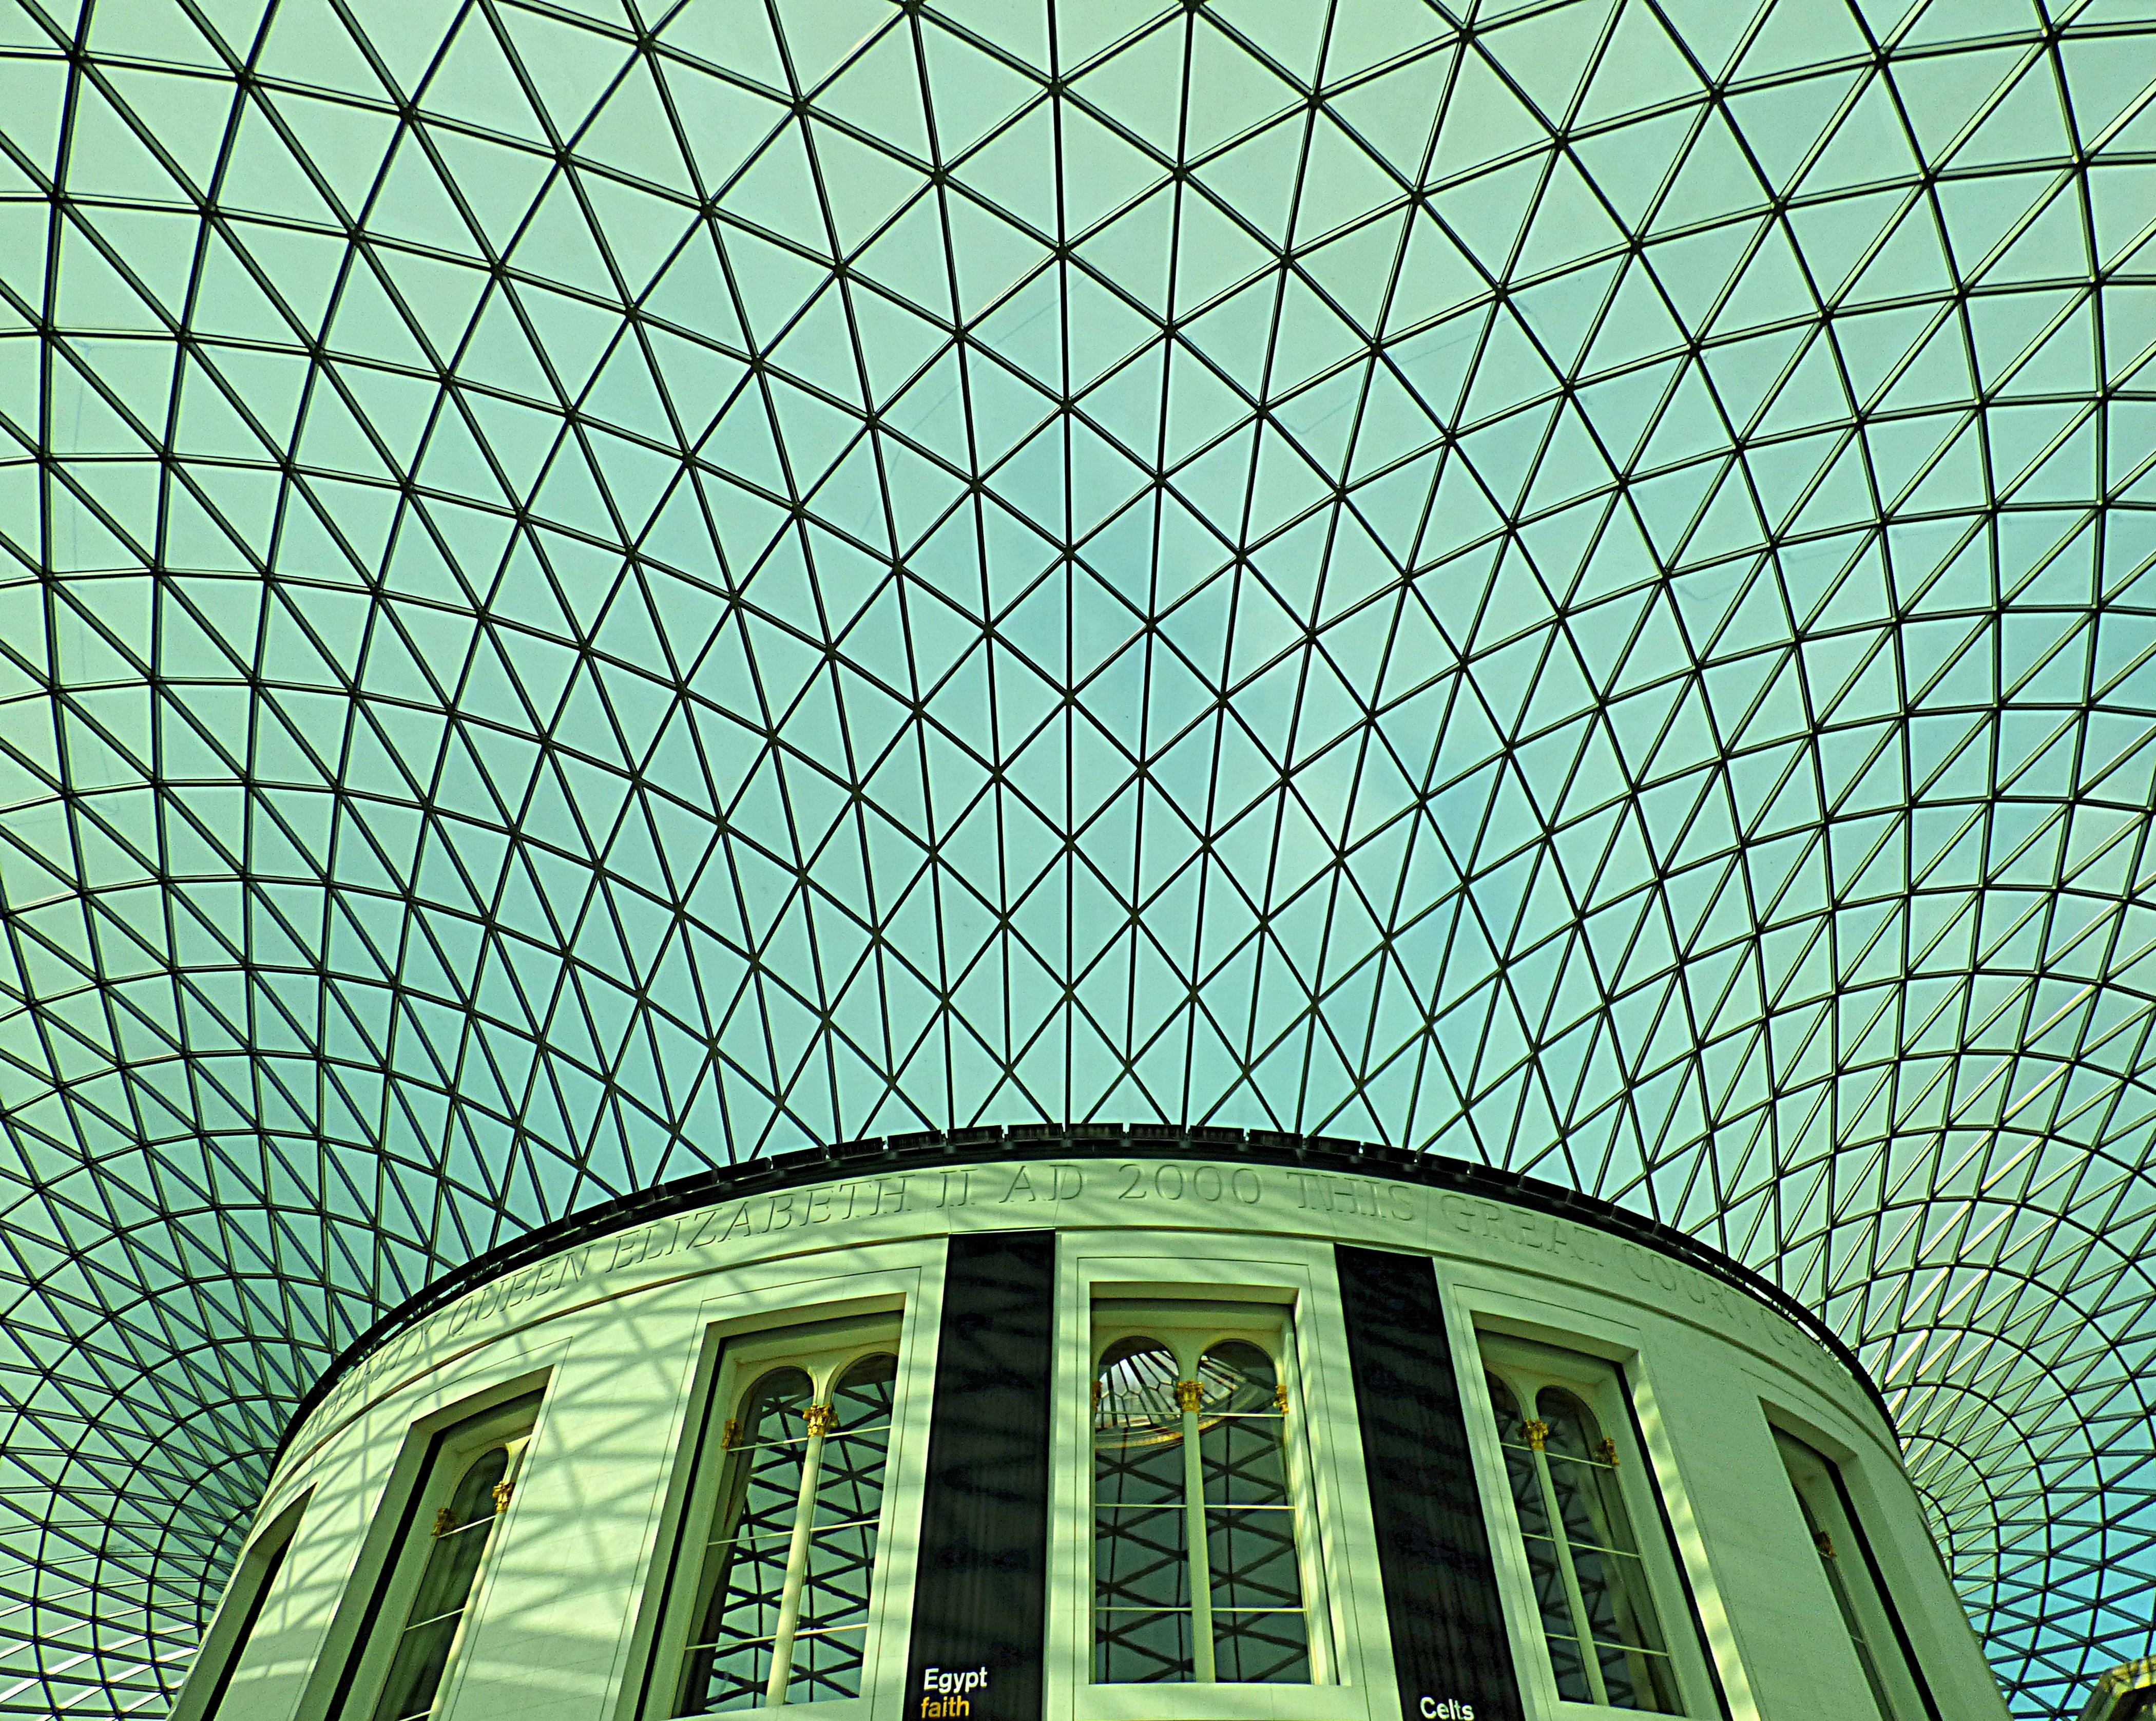 Fotos gratis : arquitectura, estructura, ventana, vaso, rascacielos ...